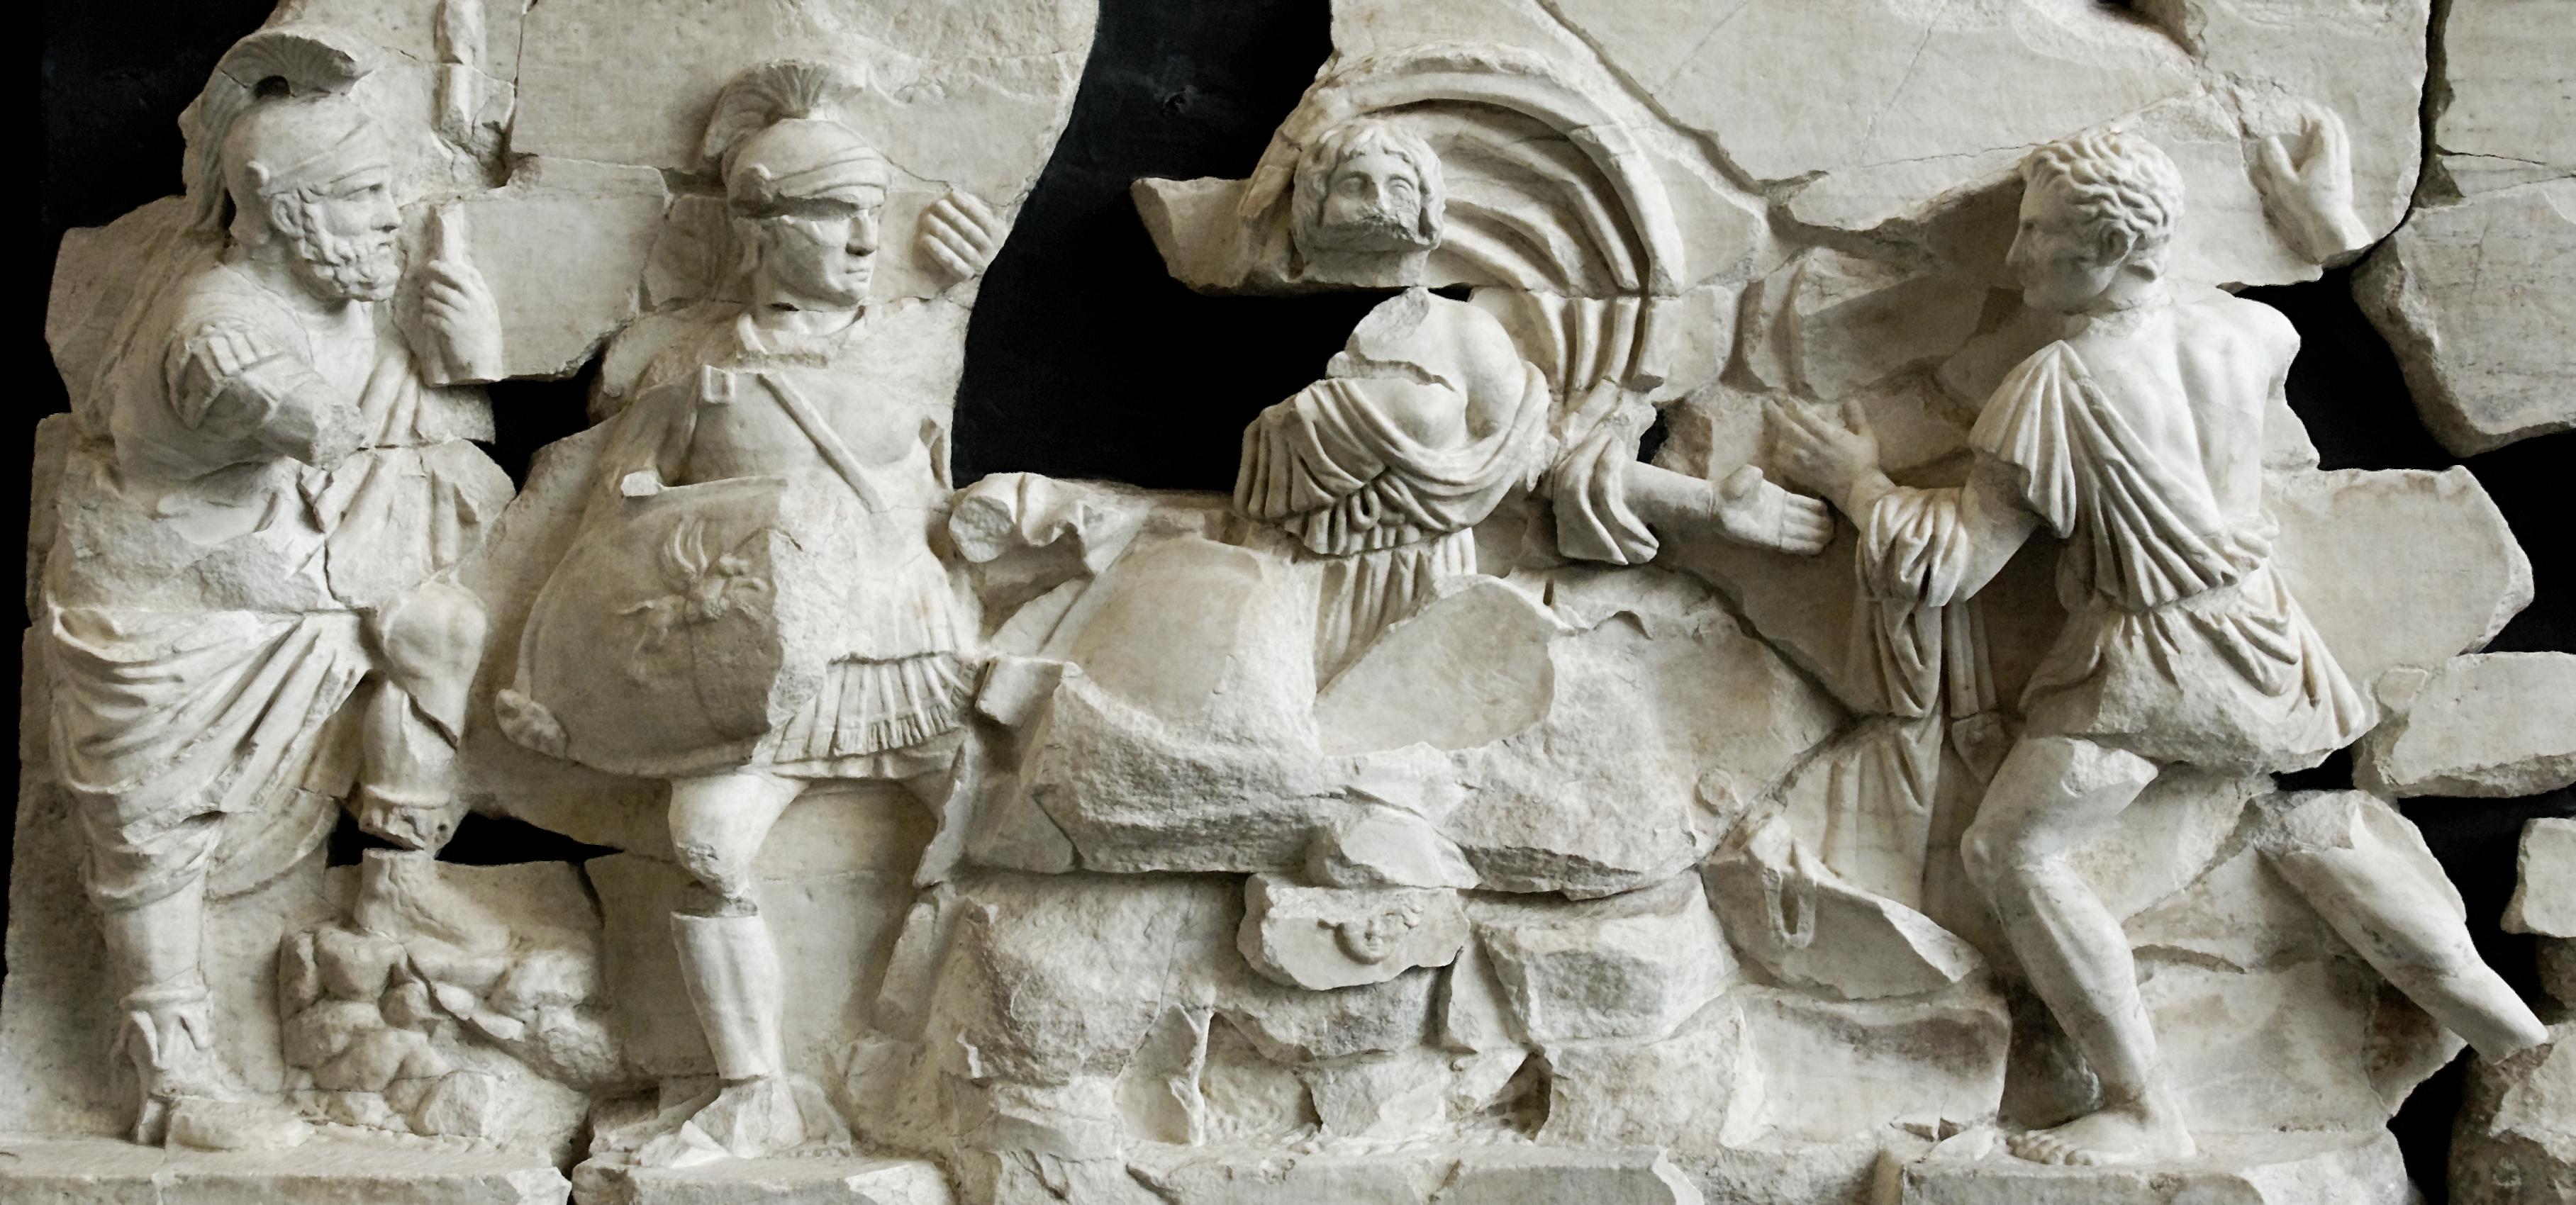 Frieze Basilica Aemilia Massimo n3.jpg